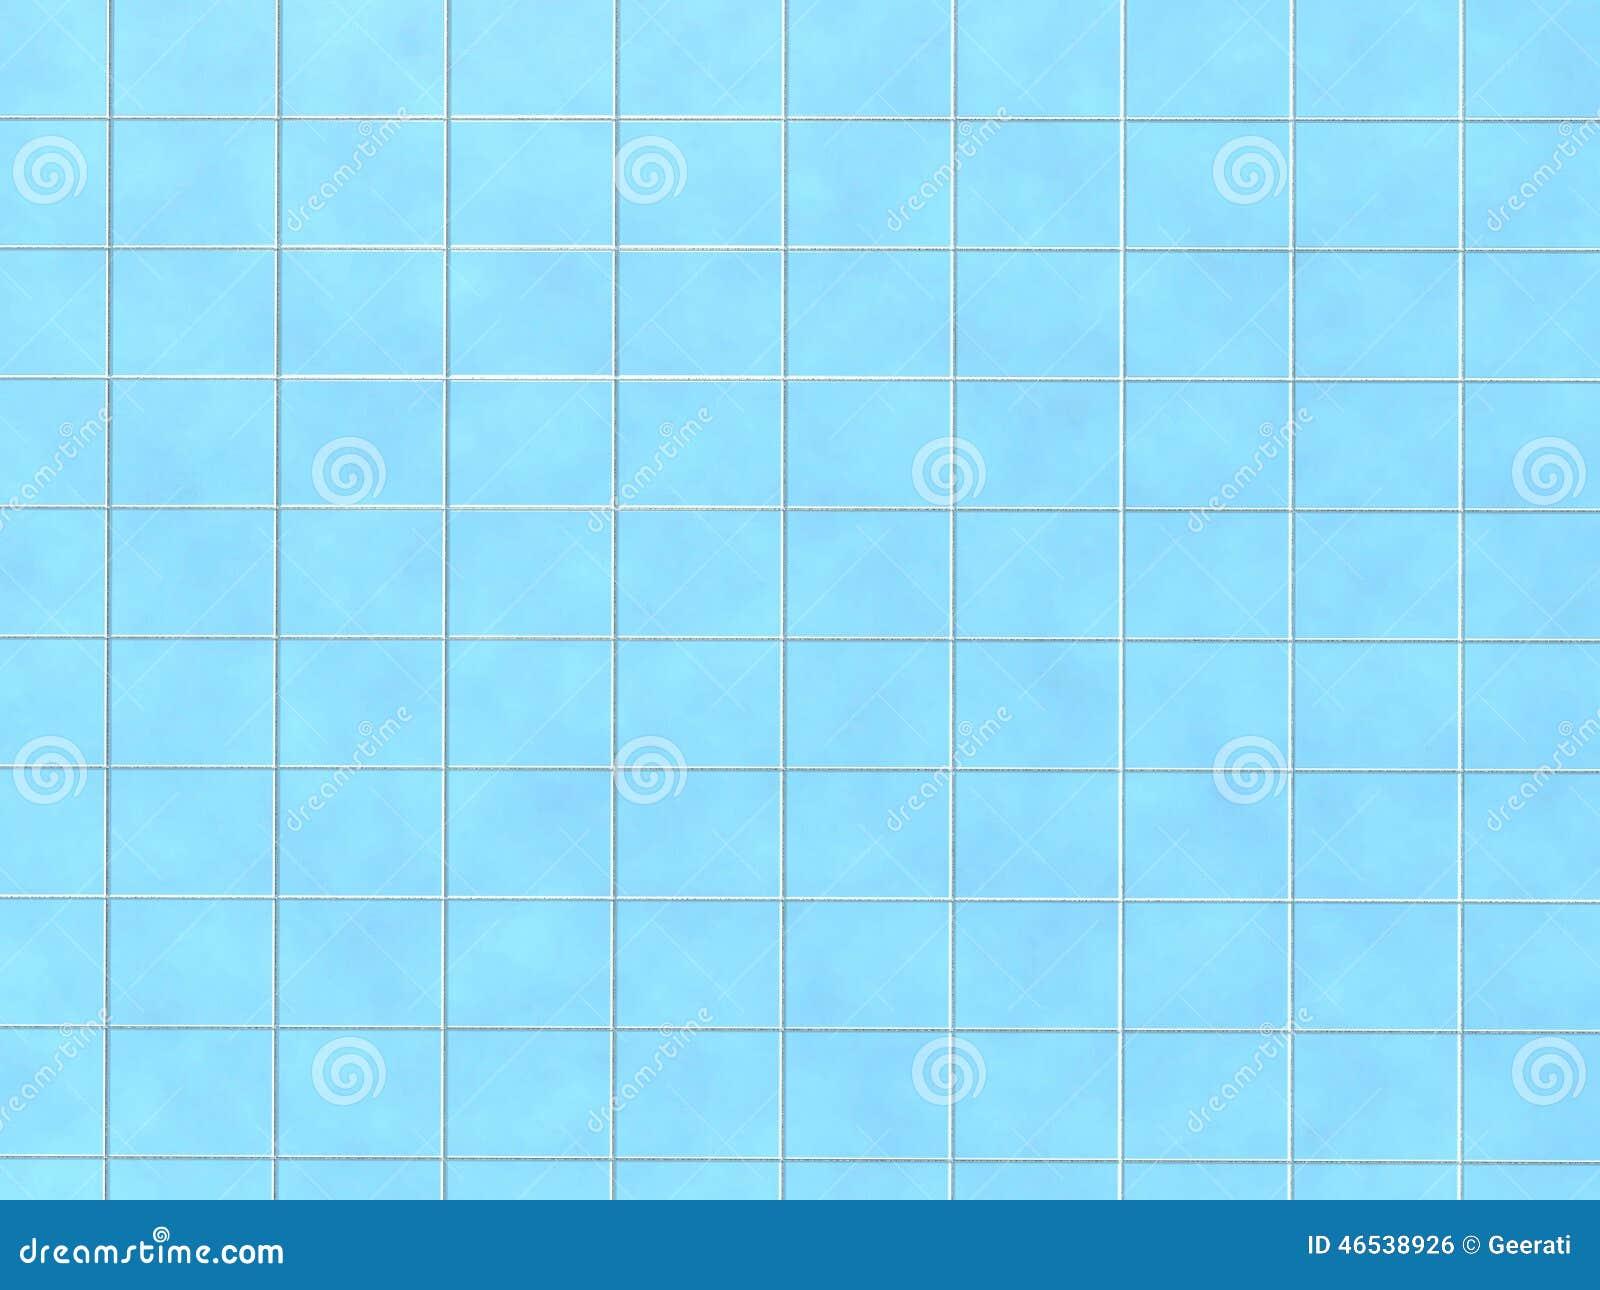 Download Blue ceramic tile pattern stock photo. Image of background - 46538926